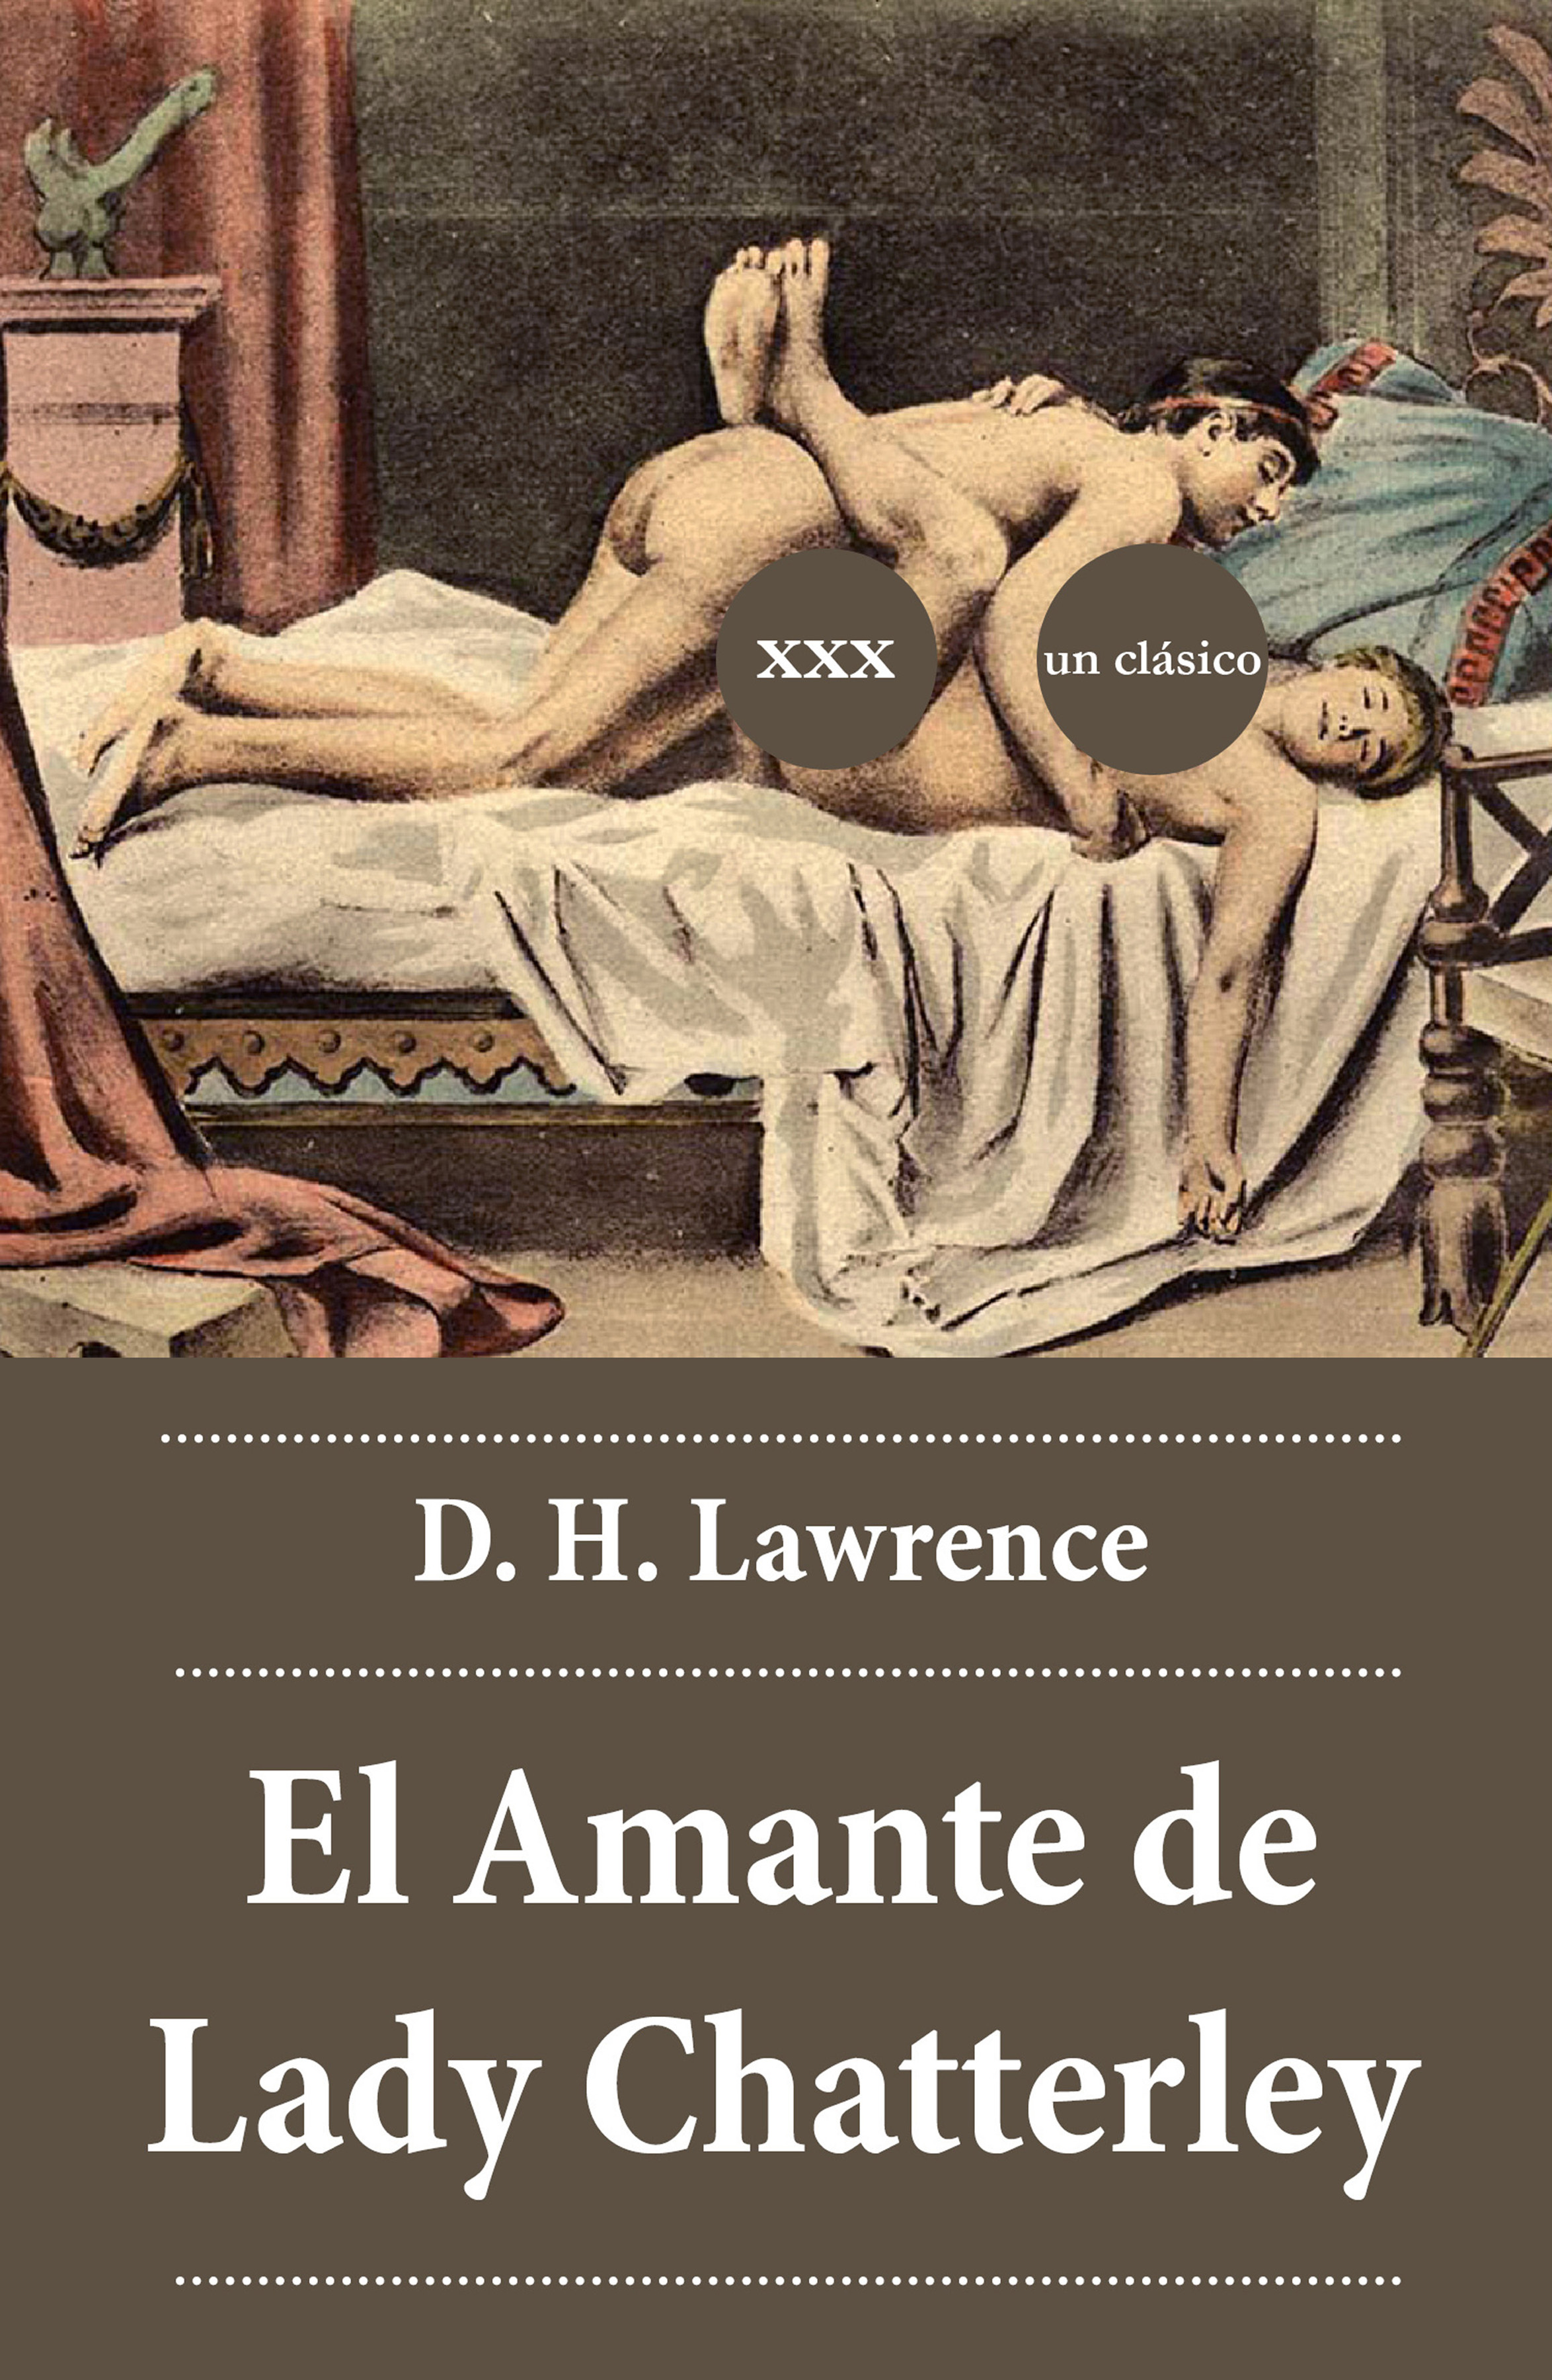 цена D. H. Lawrence El Amante de Lady Chatterley онлайн в 2017 году